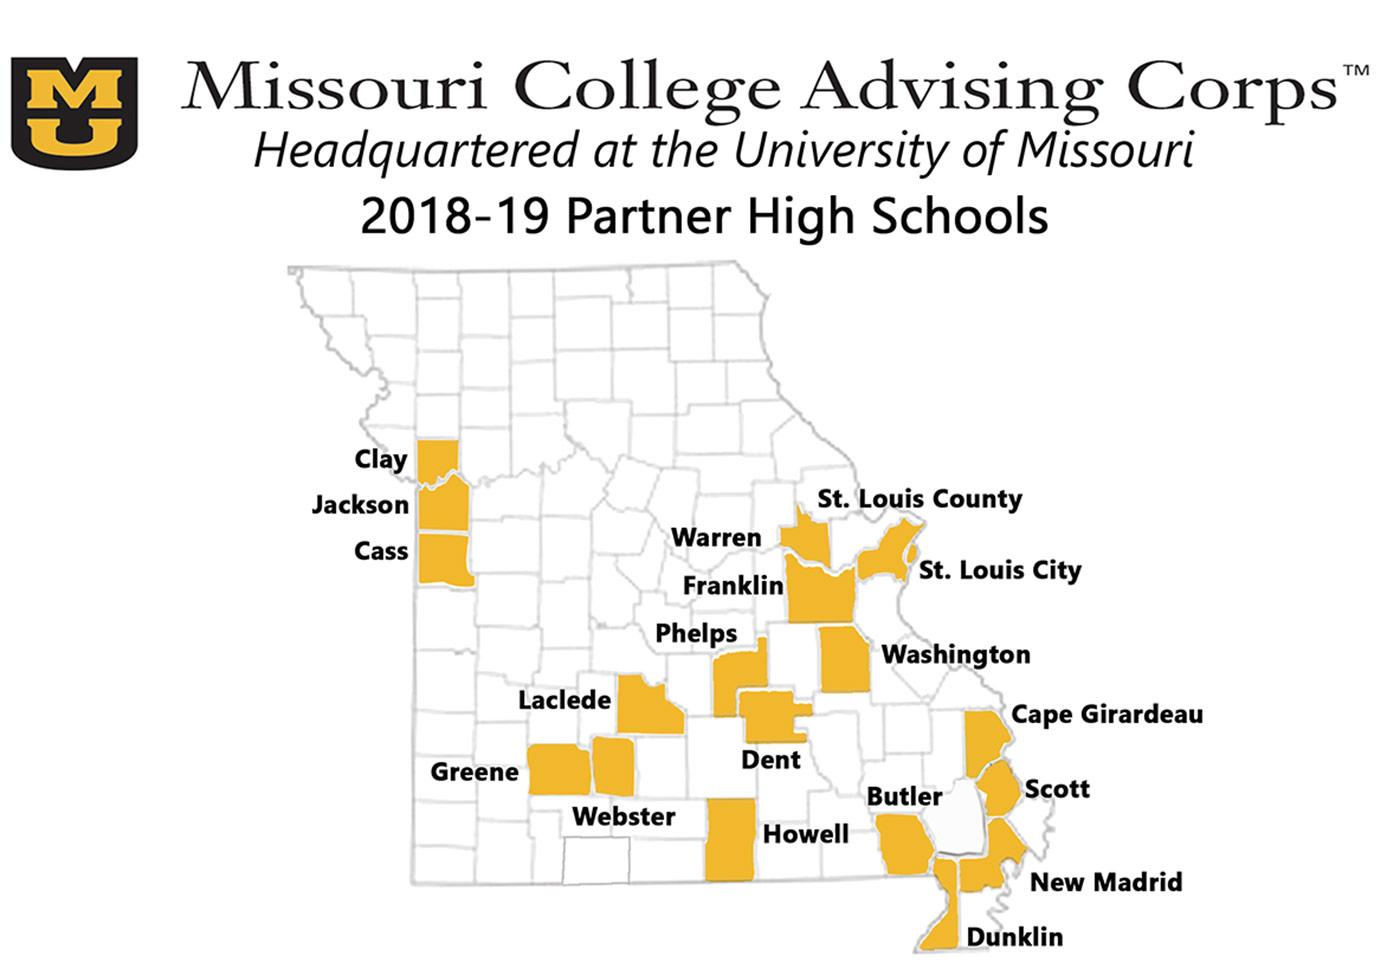 2018-19 MCAC Partner High Schools map